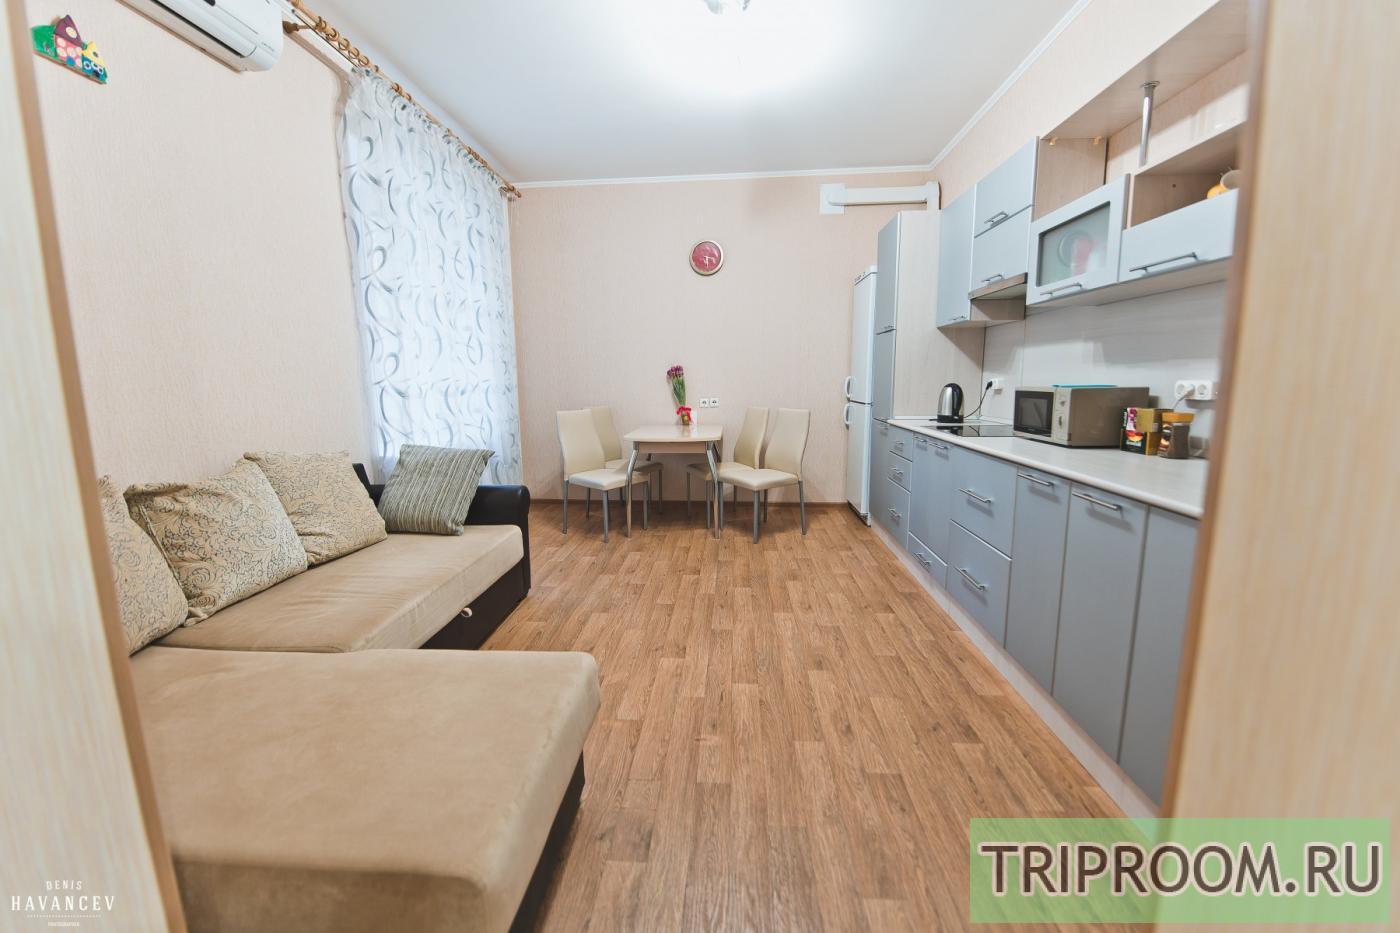 1-комнатная квартира посуточно (вариант № 14832), ул. Пугачева улица, фото № 3